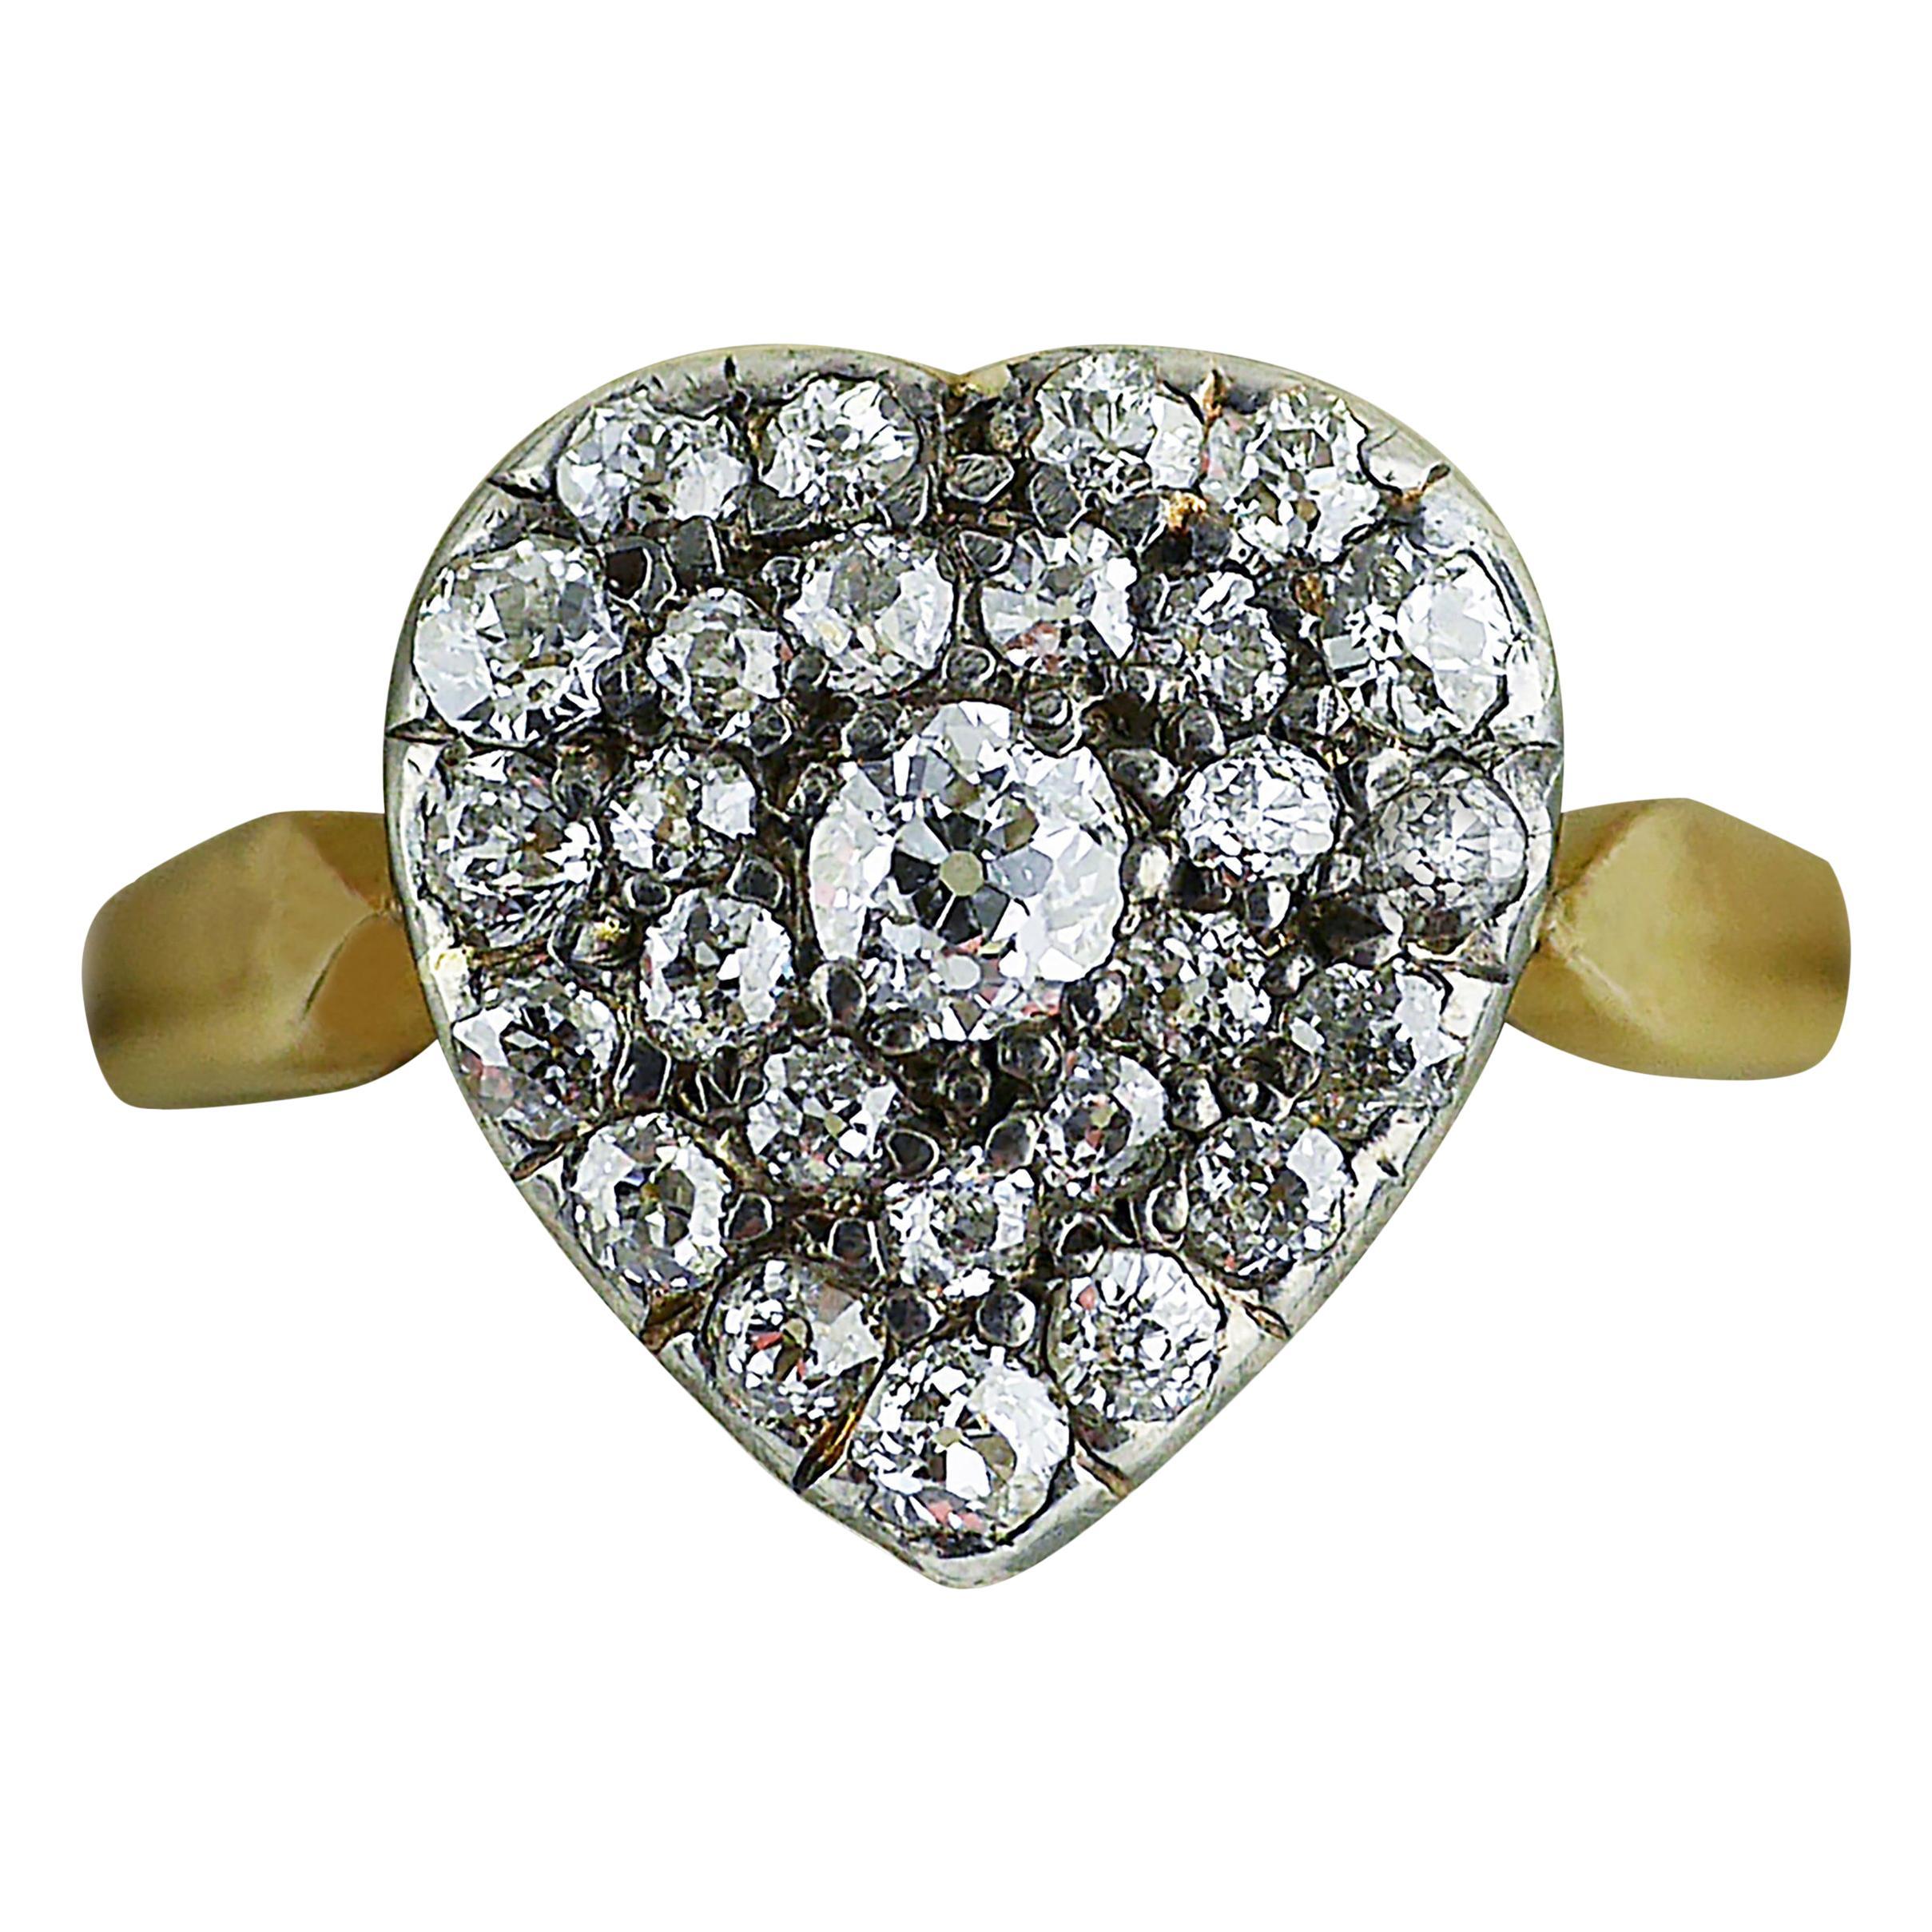 Victorian Diamond Heart Ring, circa 1870